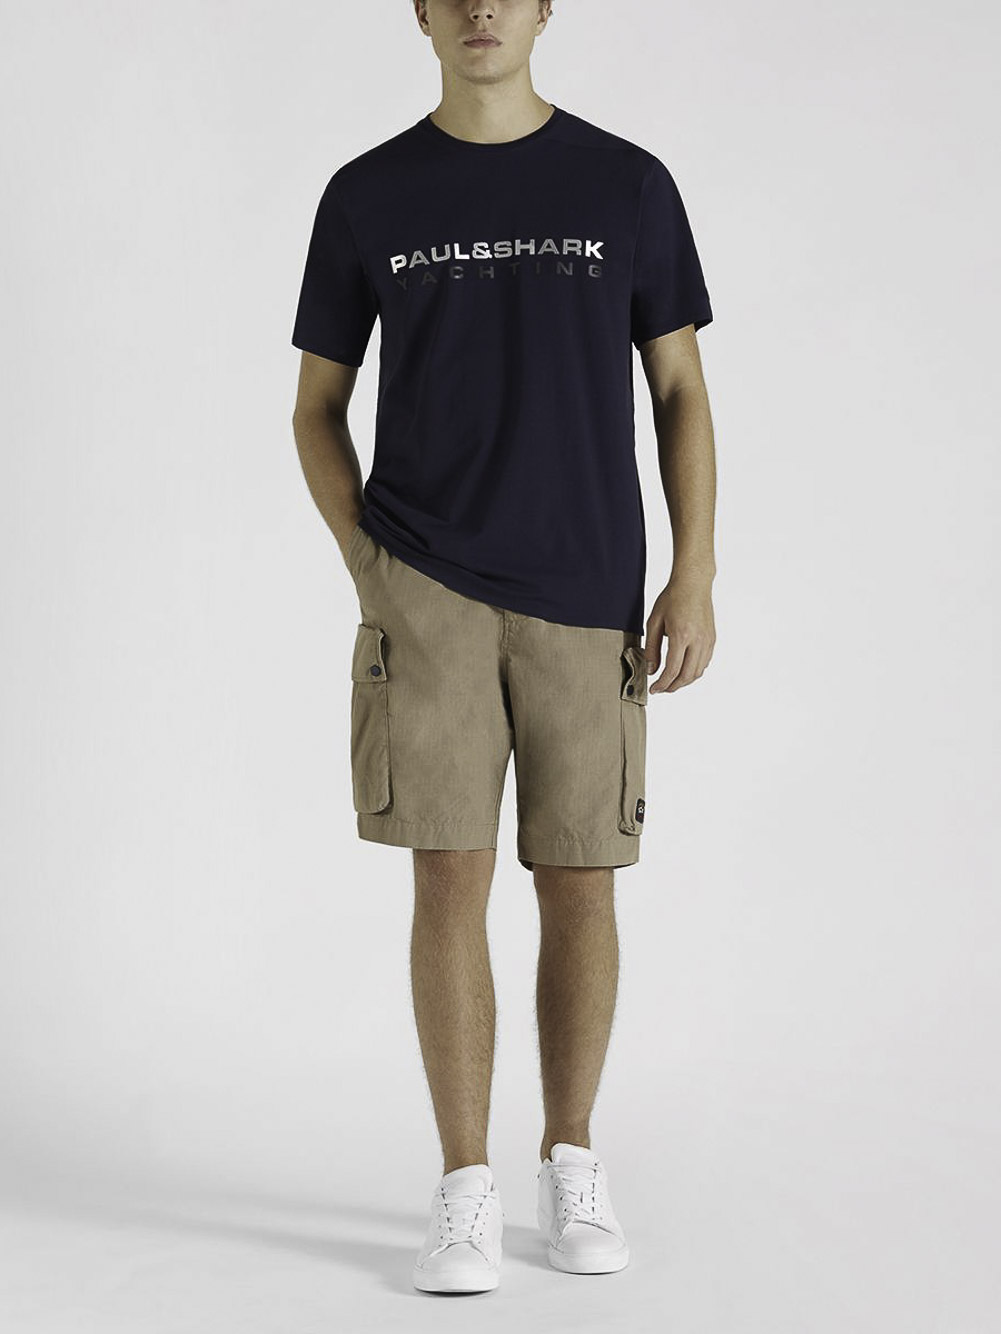 PAUL & SHARK Μπλούζα T-Shirt 21411020 ΜΠΛΕ